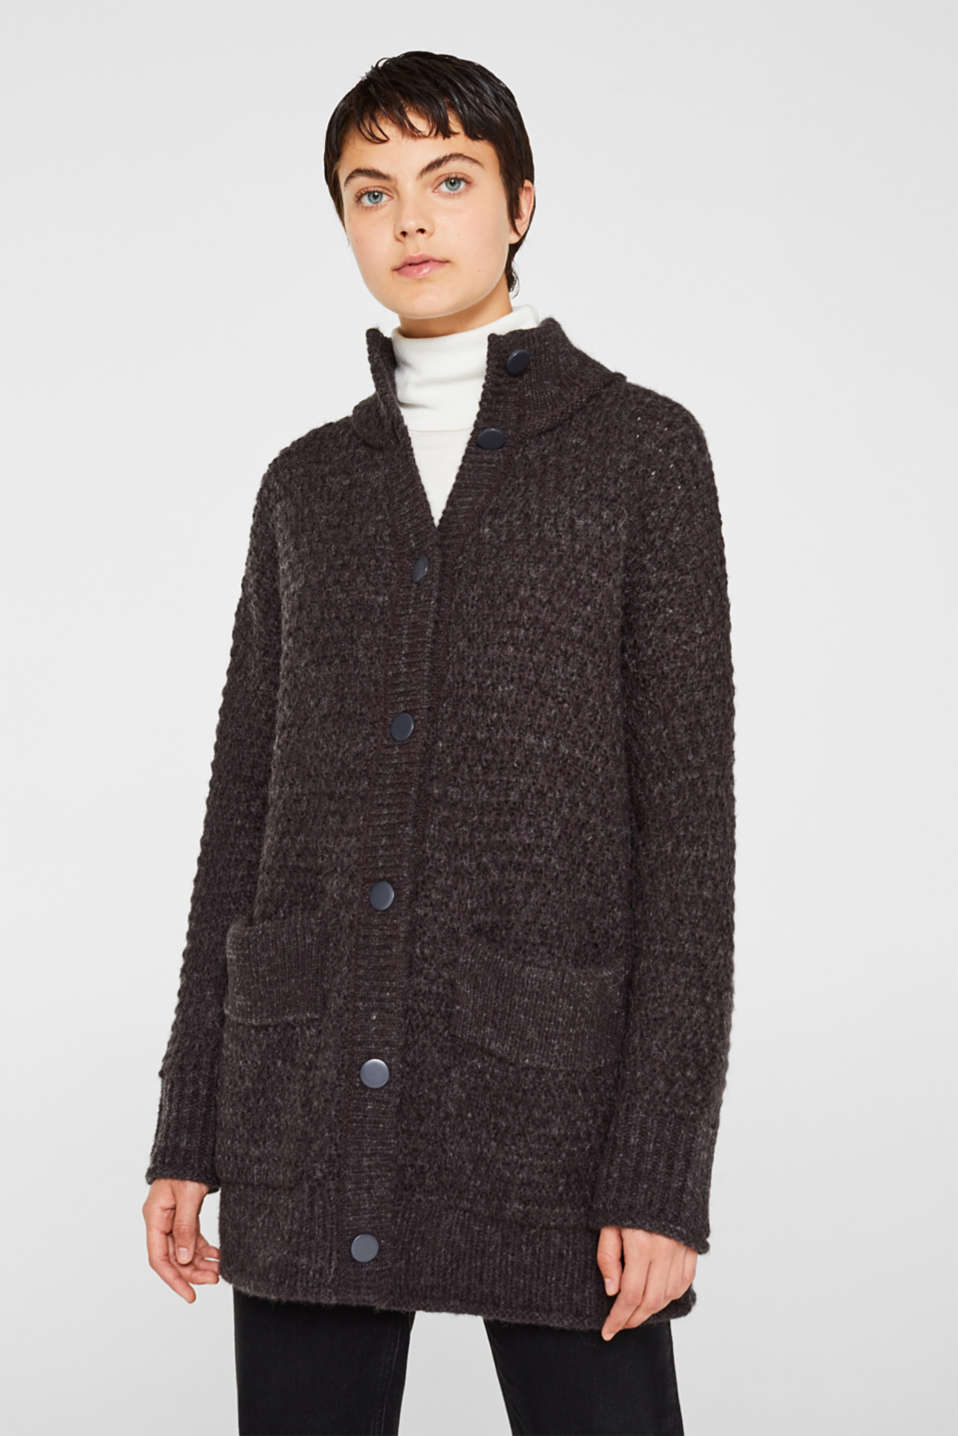 Sweaters cardigan, DARK GREY 5, detail image number 0